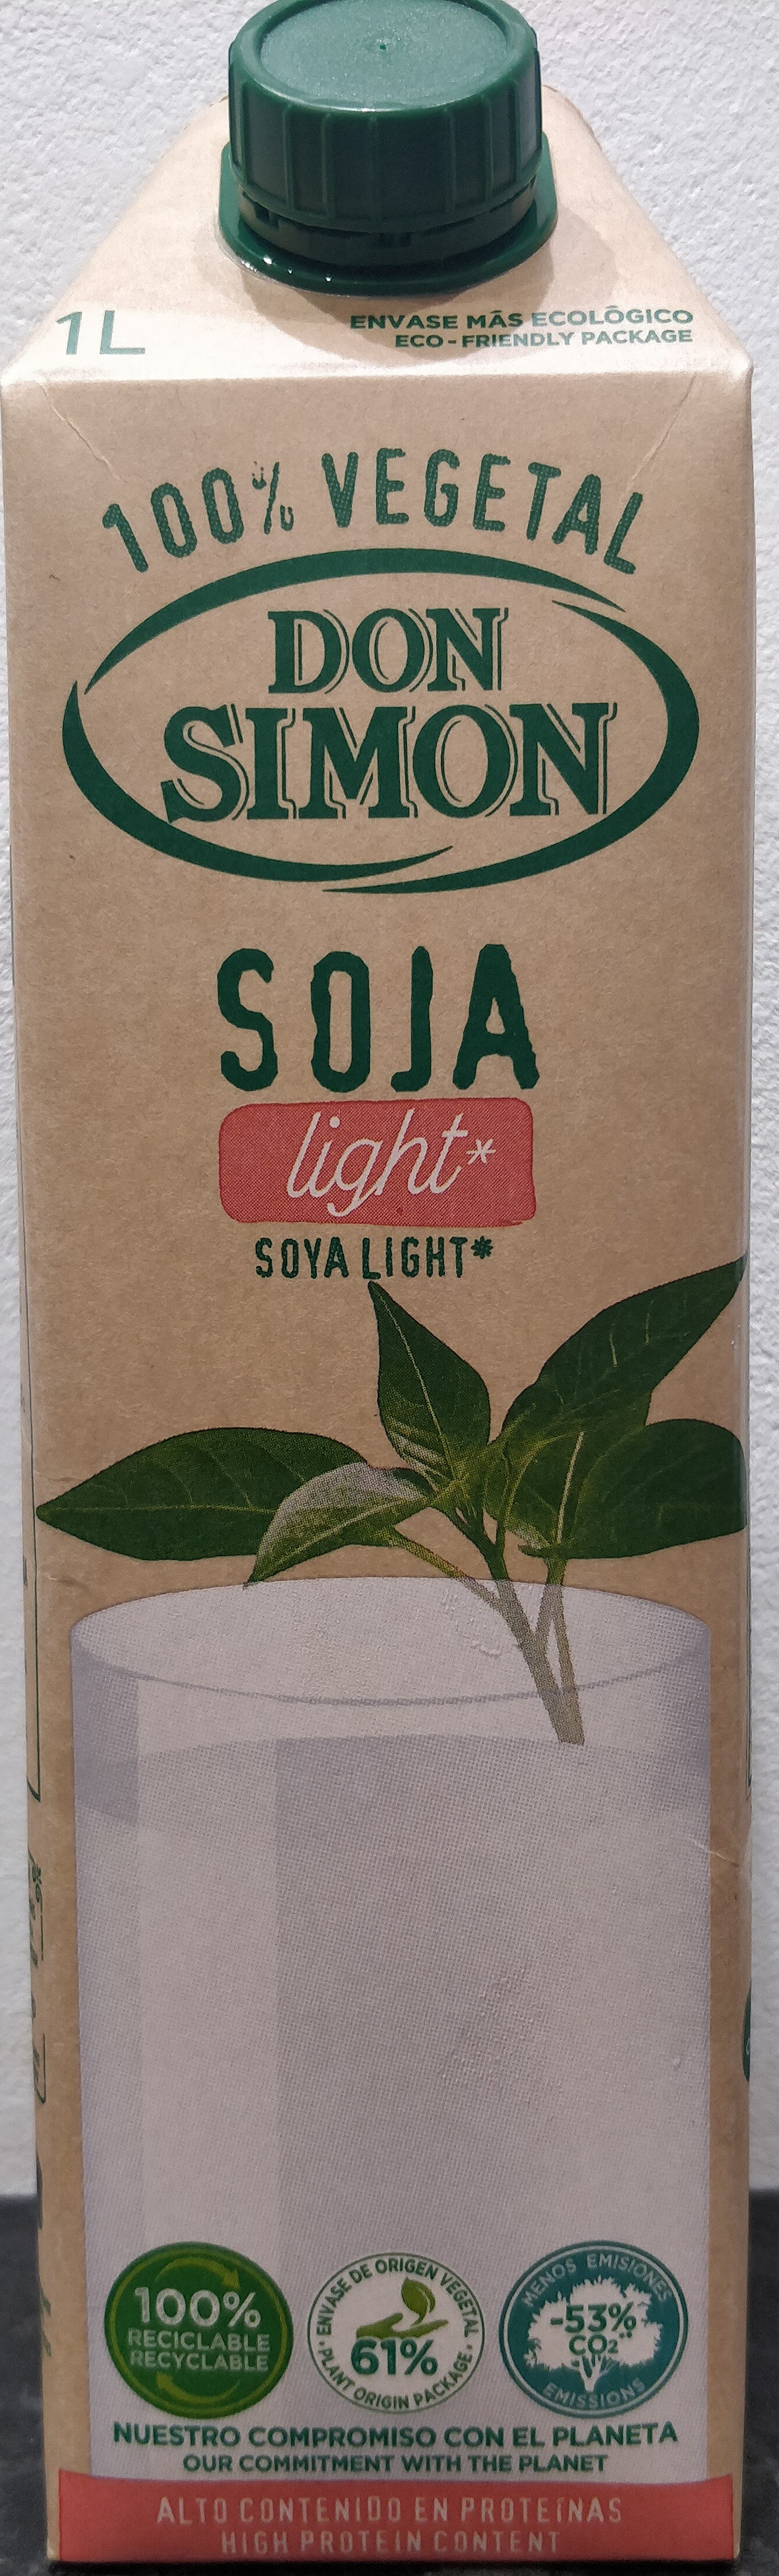 Soy Don Simón Soja Light - Ingredients - es